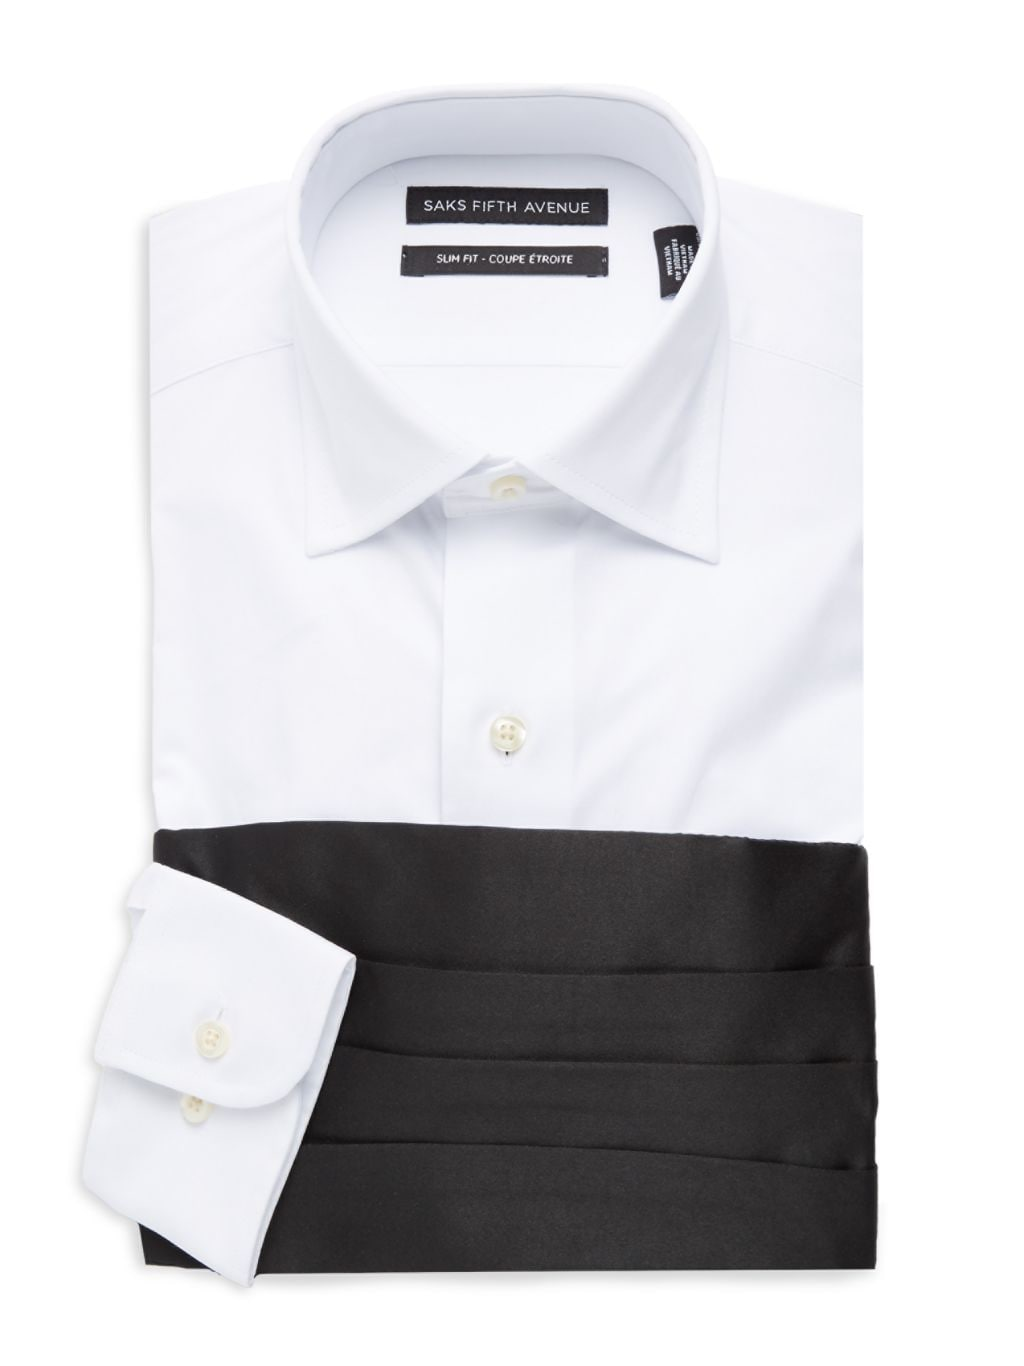 Saks Fifth Avenue 3-Piece Dress Shirt, Bow Tie & Cummerband Set